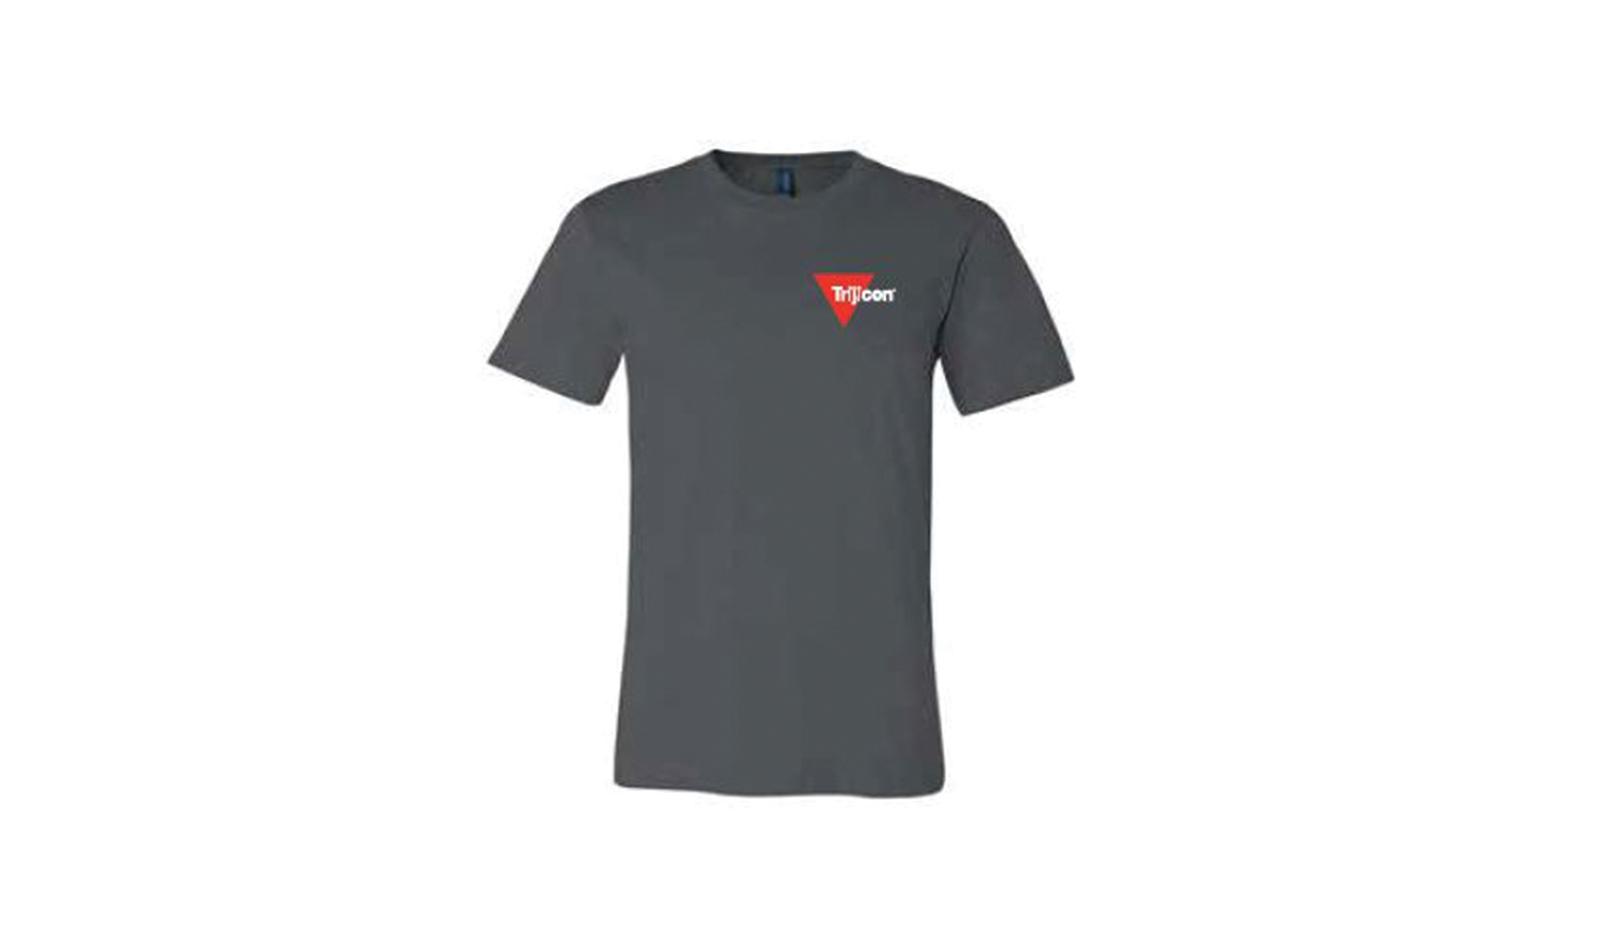 Trijicon<sup>®</sup> Jersey T-Shirt - Gray - XL